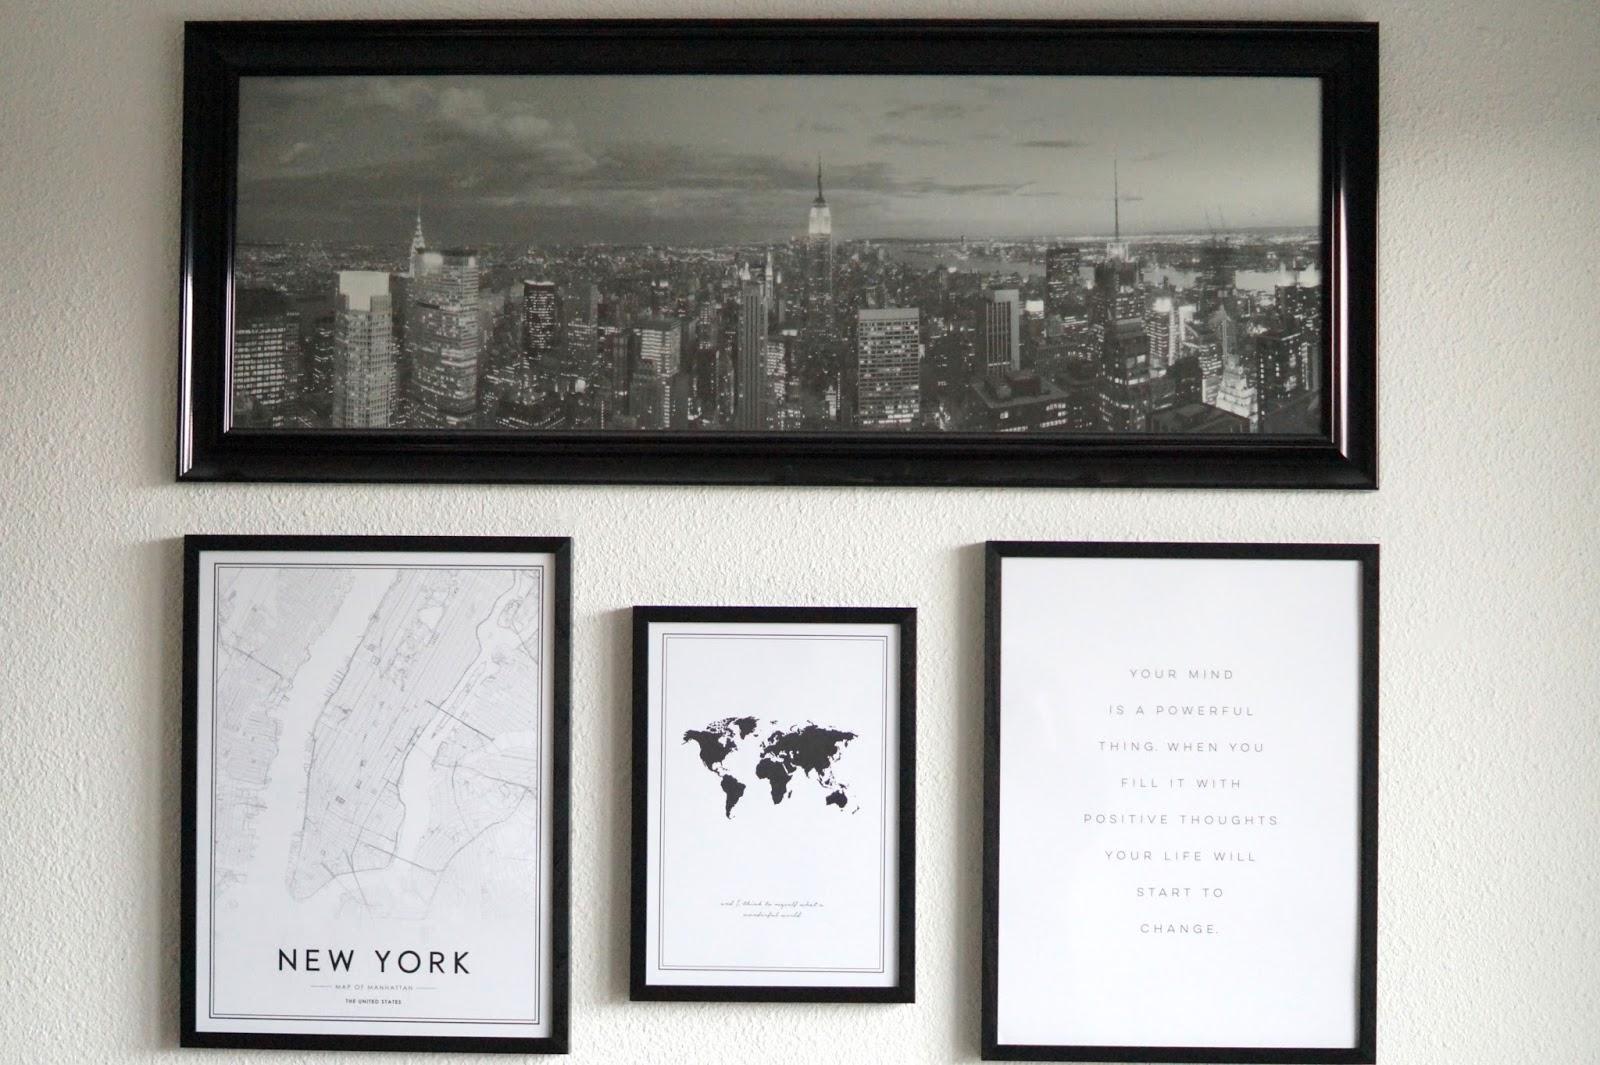 cadre new york conforama 28 images bon plan affiches et cadres chicas de revista mode. Black Bedroom Furniture Sets. Home Design Ideas